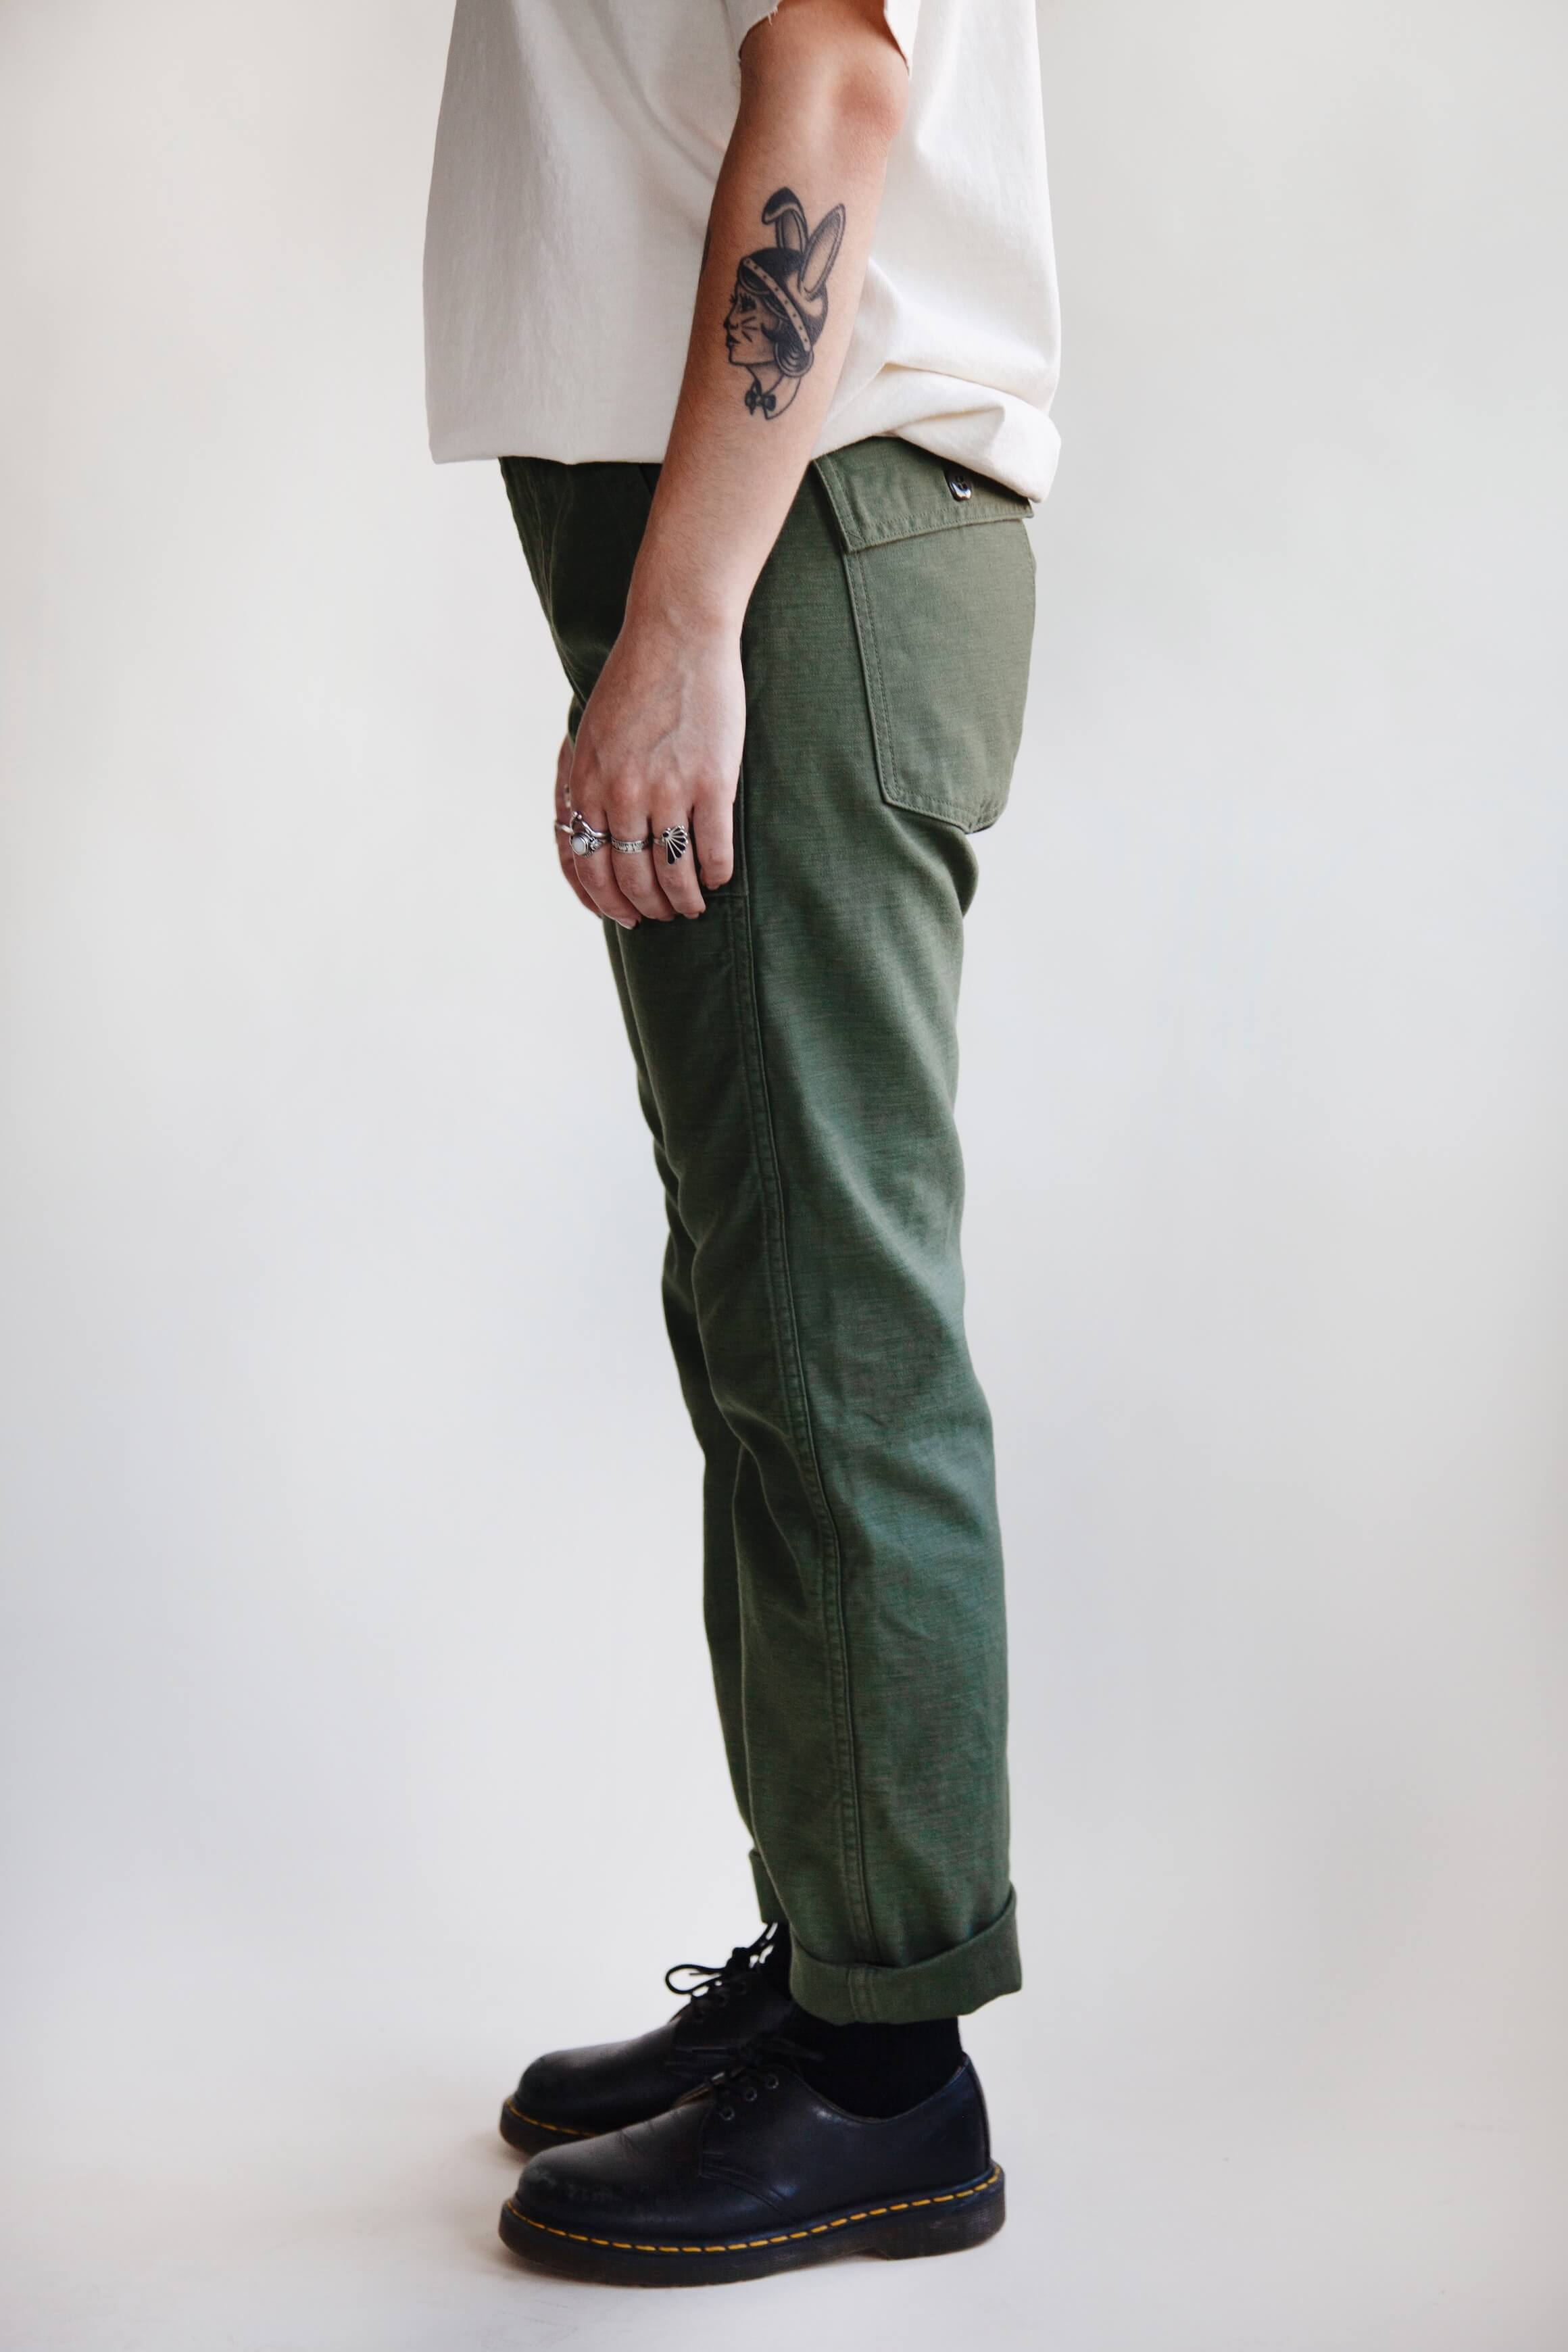 orslow Slim Fit Fatigue Pants - Olive Reverse Sateen on female model